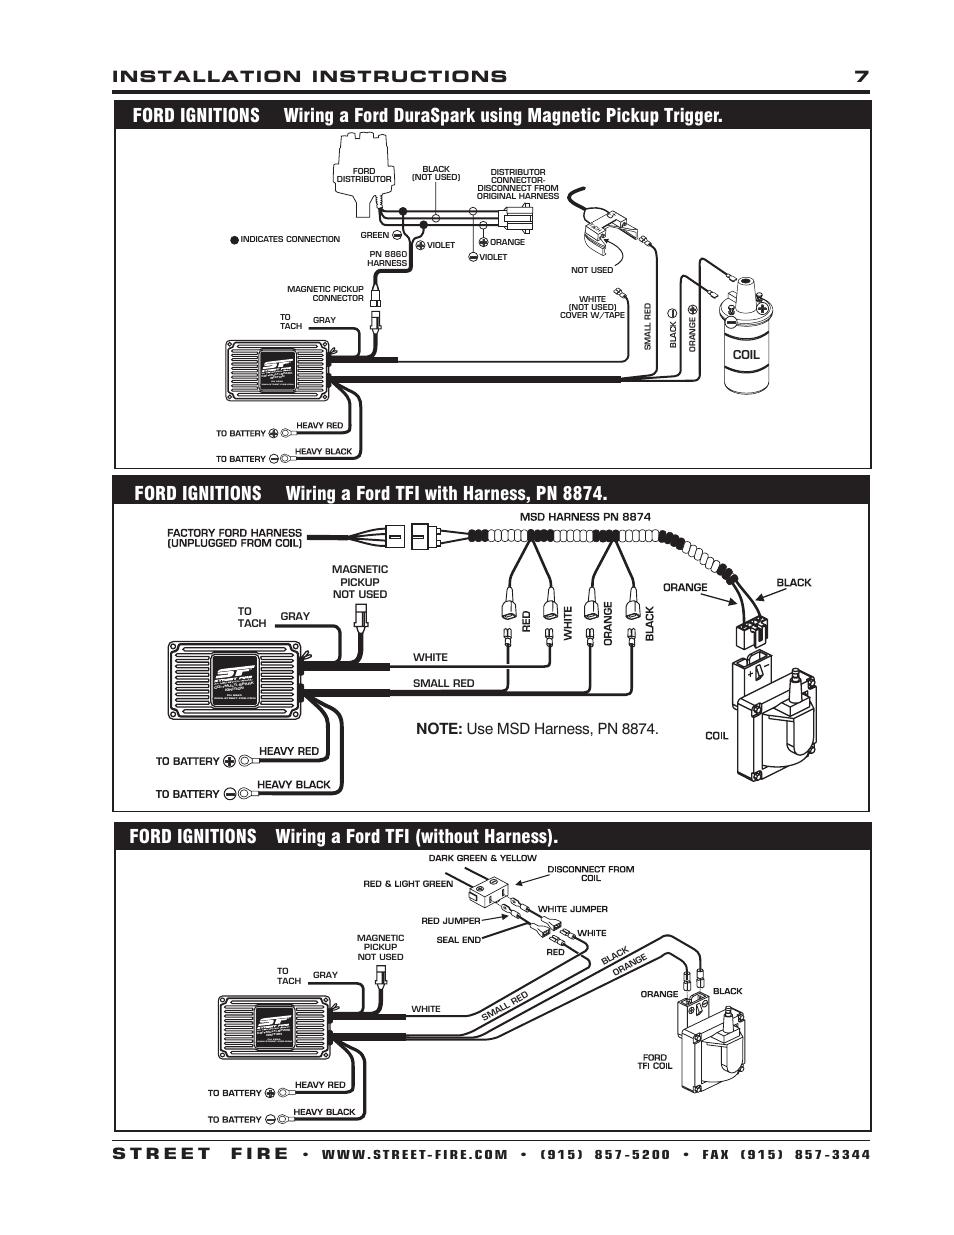 27 Msd Street Fire Wiring Diagram